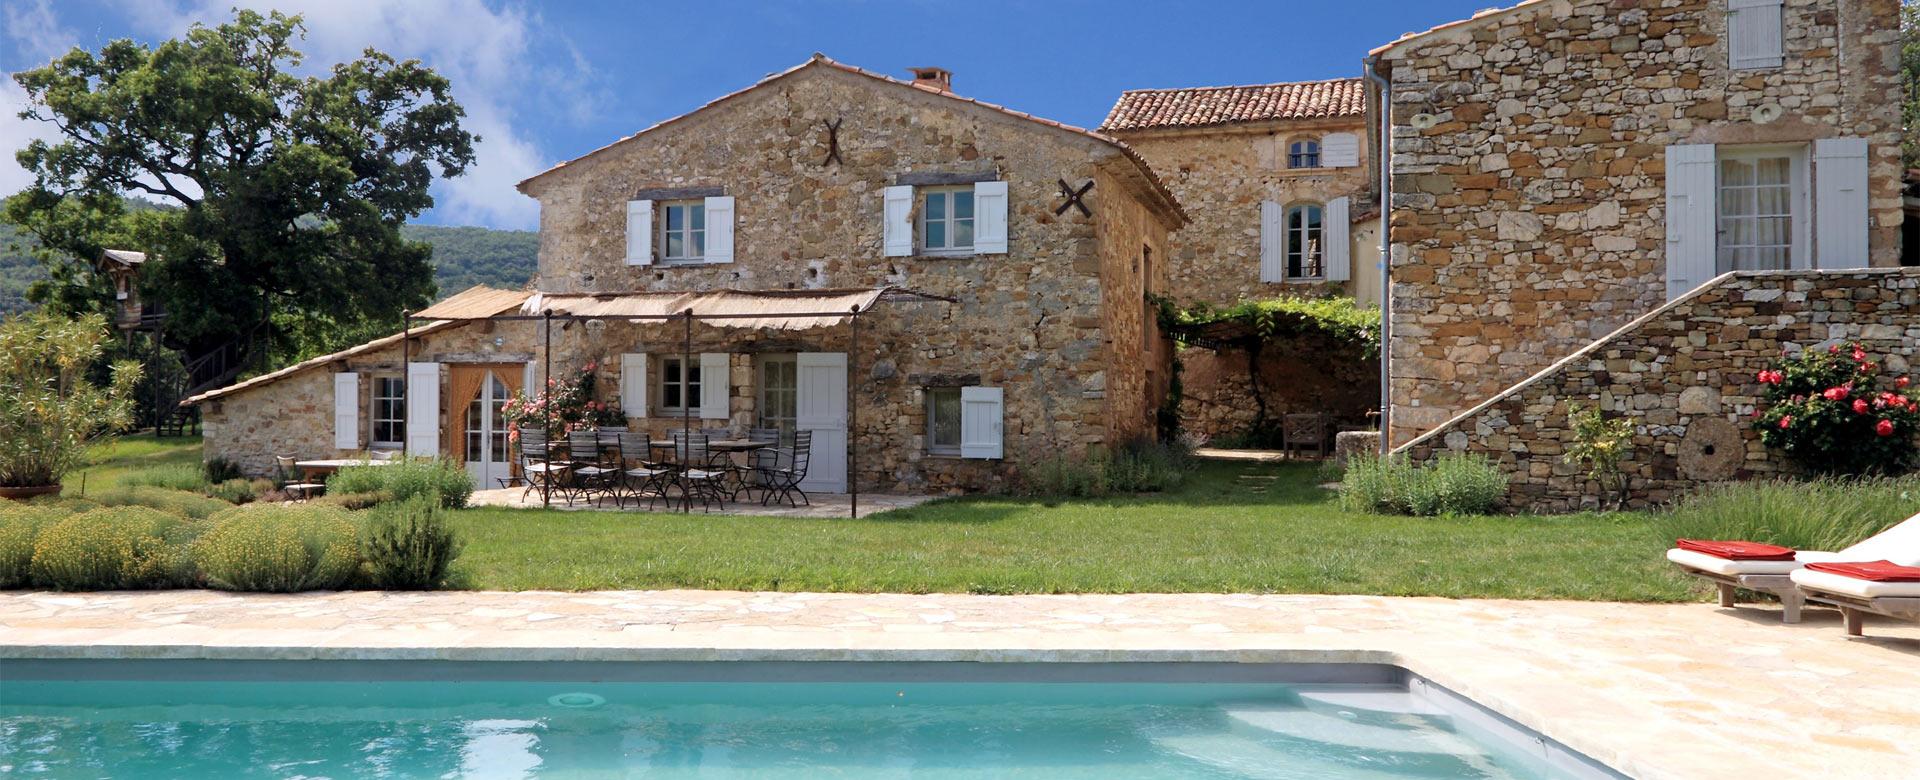 Location de villa de luxe dans le luberon villanovo - Location maison avec piscine luberon ...